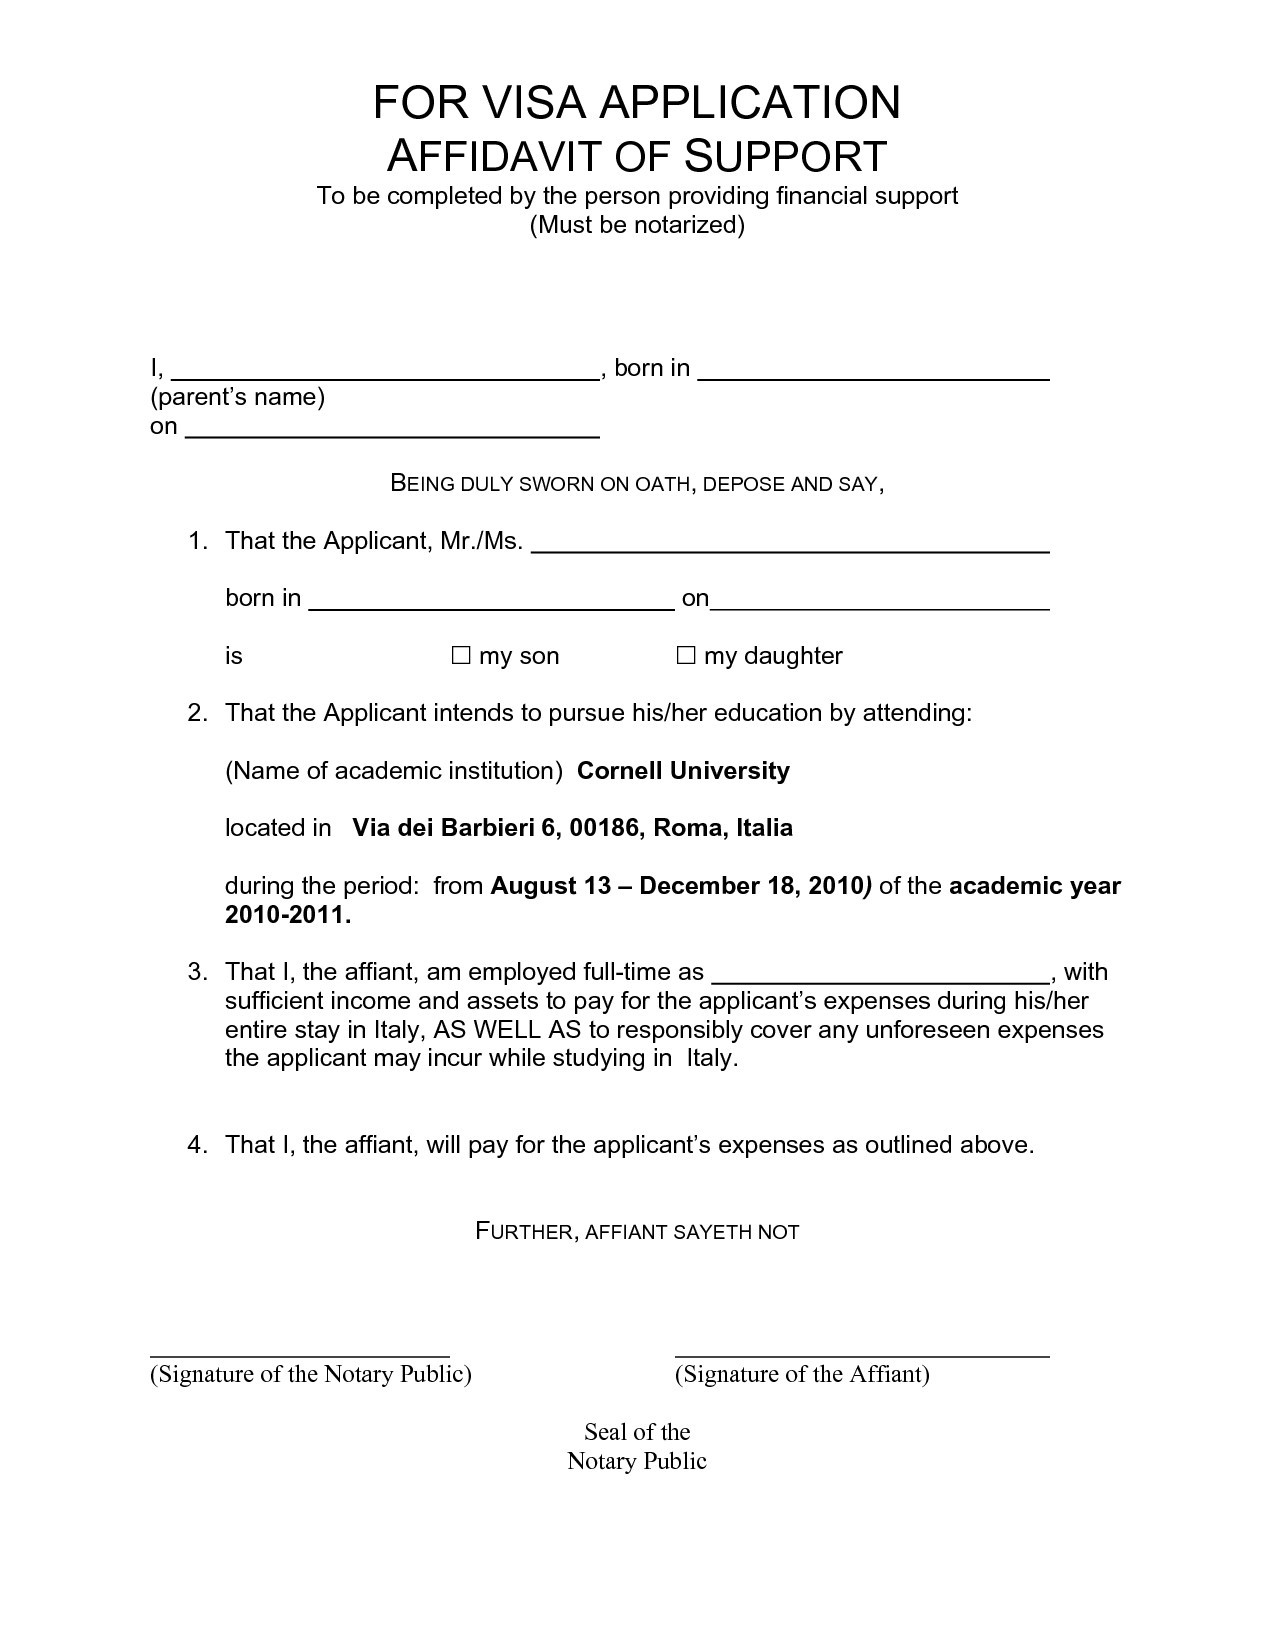 Affidavit Of Support Template Letter - Sample Affidavit Support Letter for Student Visa Inspirationa